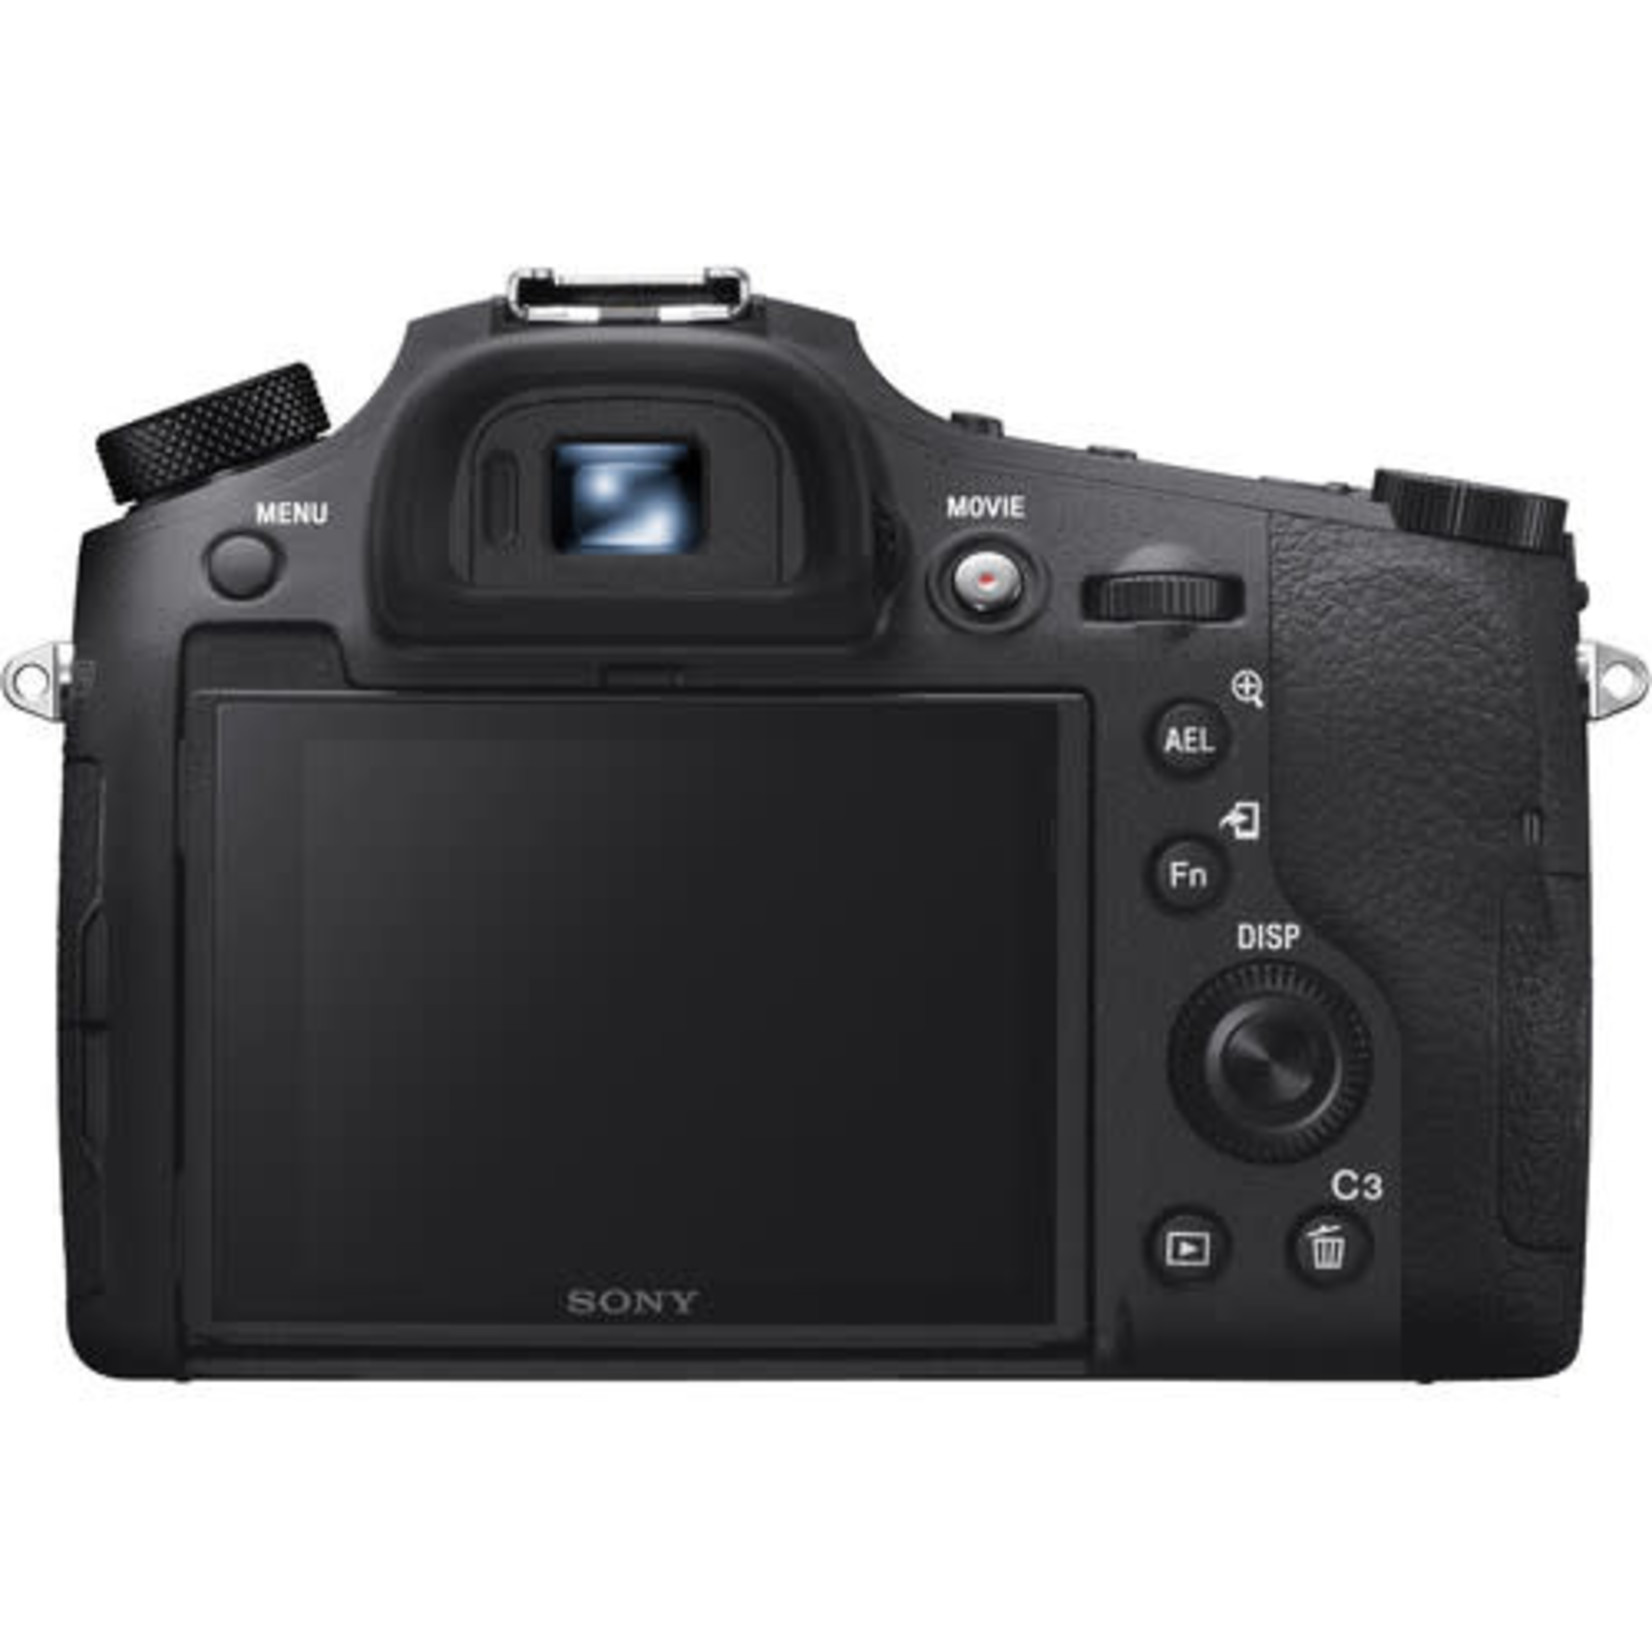 Sony Sony Cyber-shot DSC-RX10 IV Digital Camera